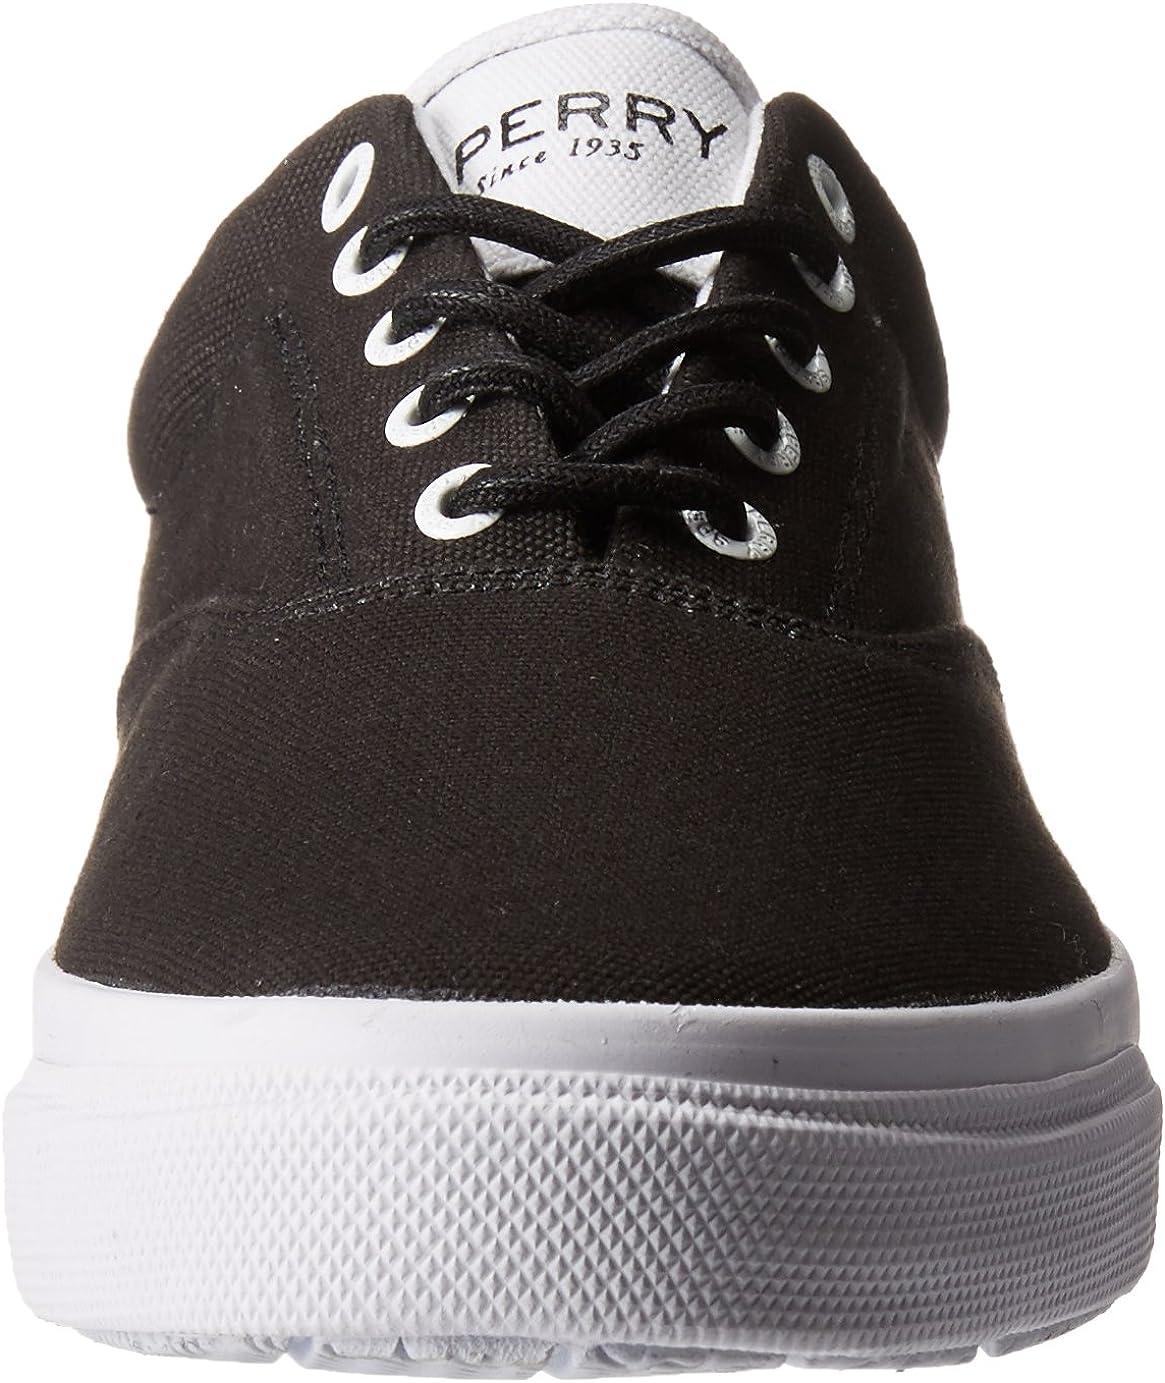 Sperry Men's Salt Washed Striper LL CVO Boat Shoe Black/White